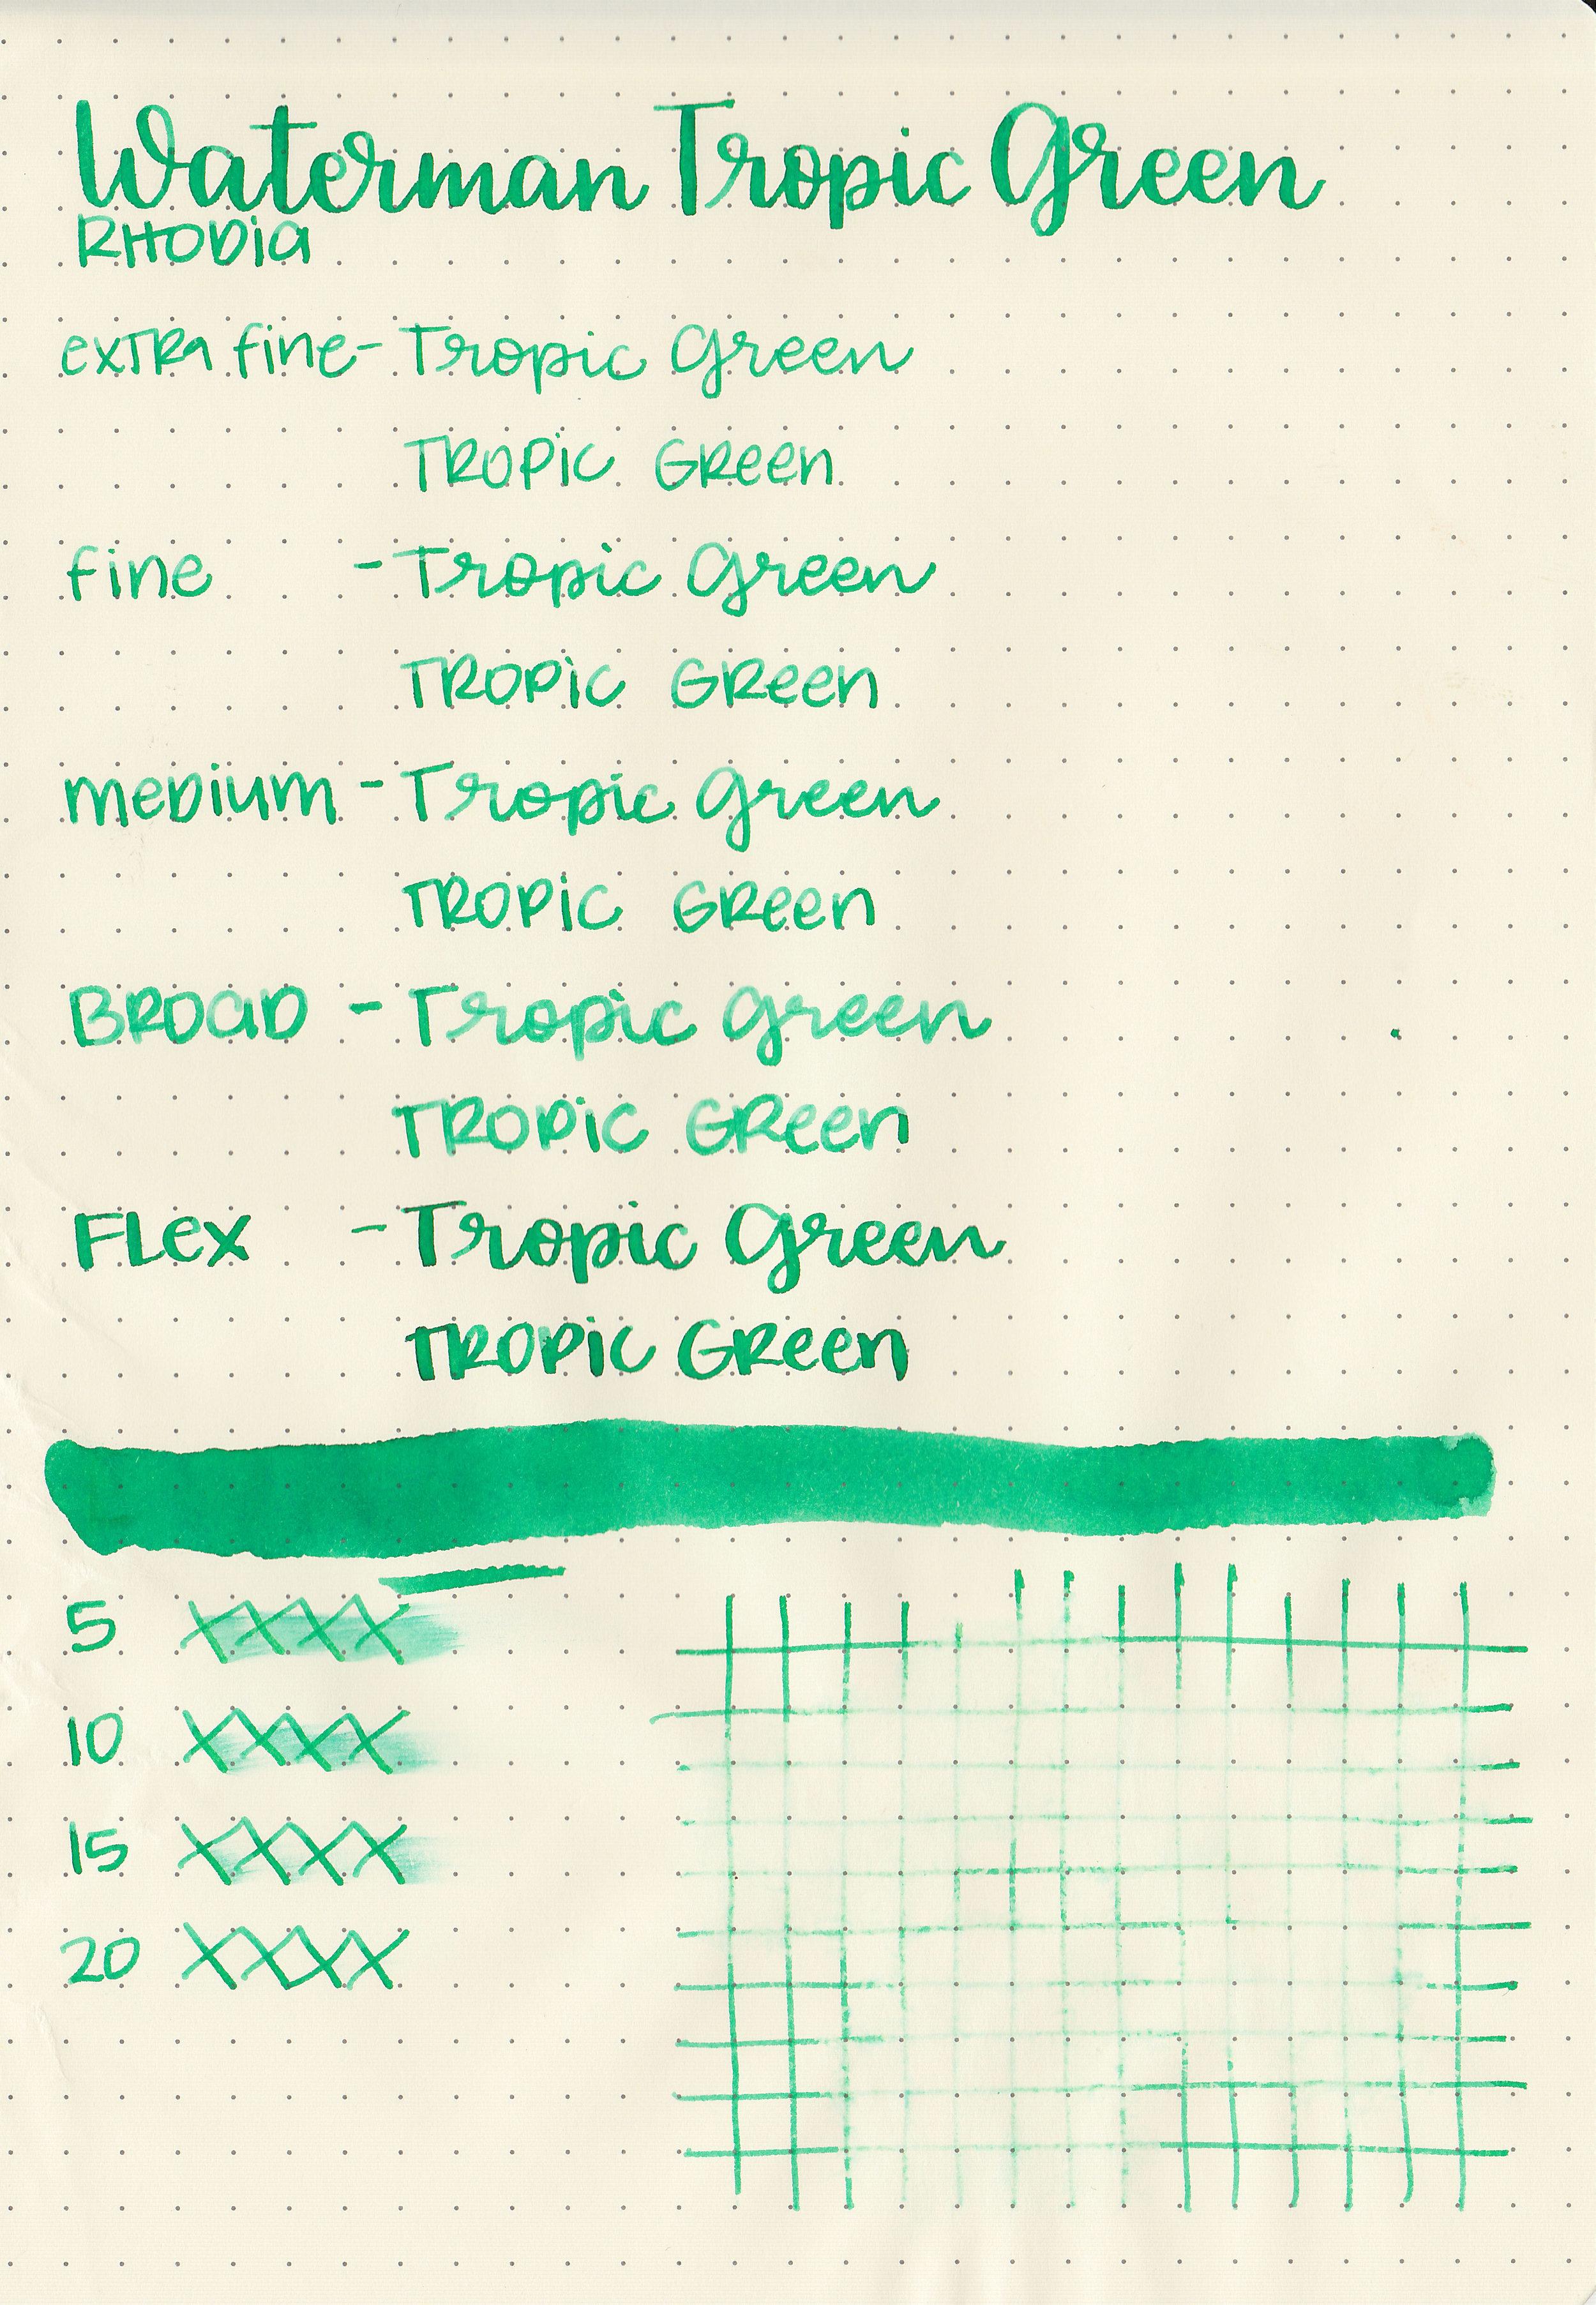 wtr-tropic-green-5.jpg